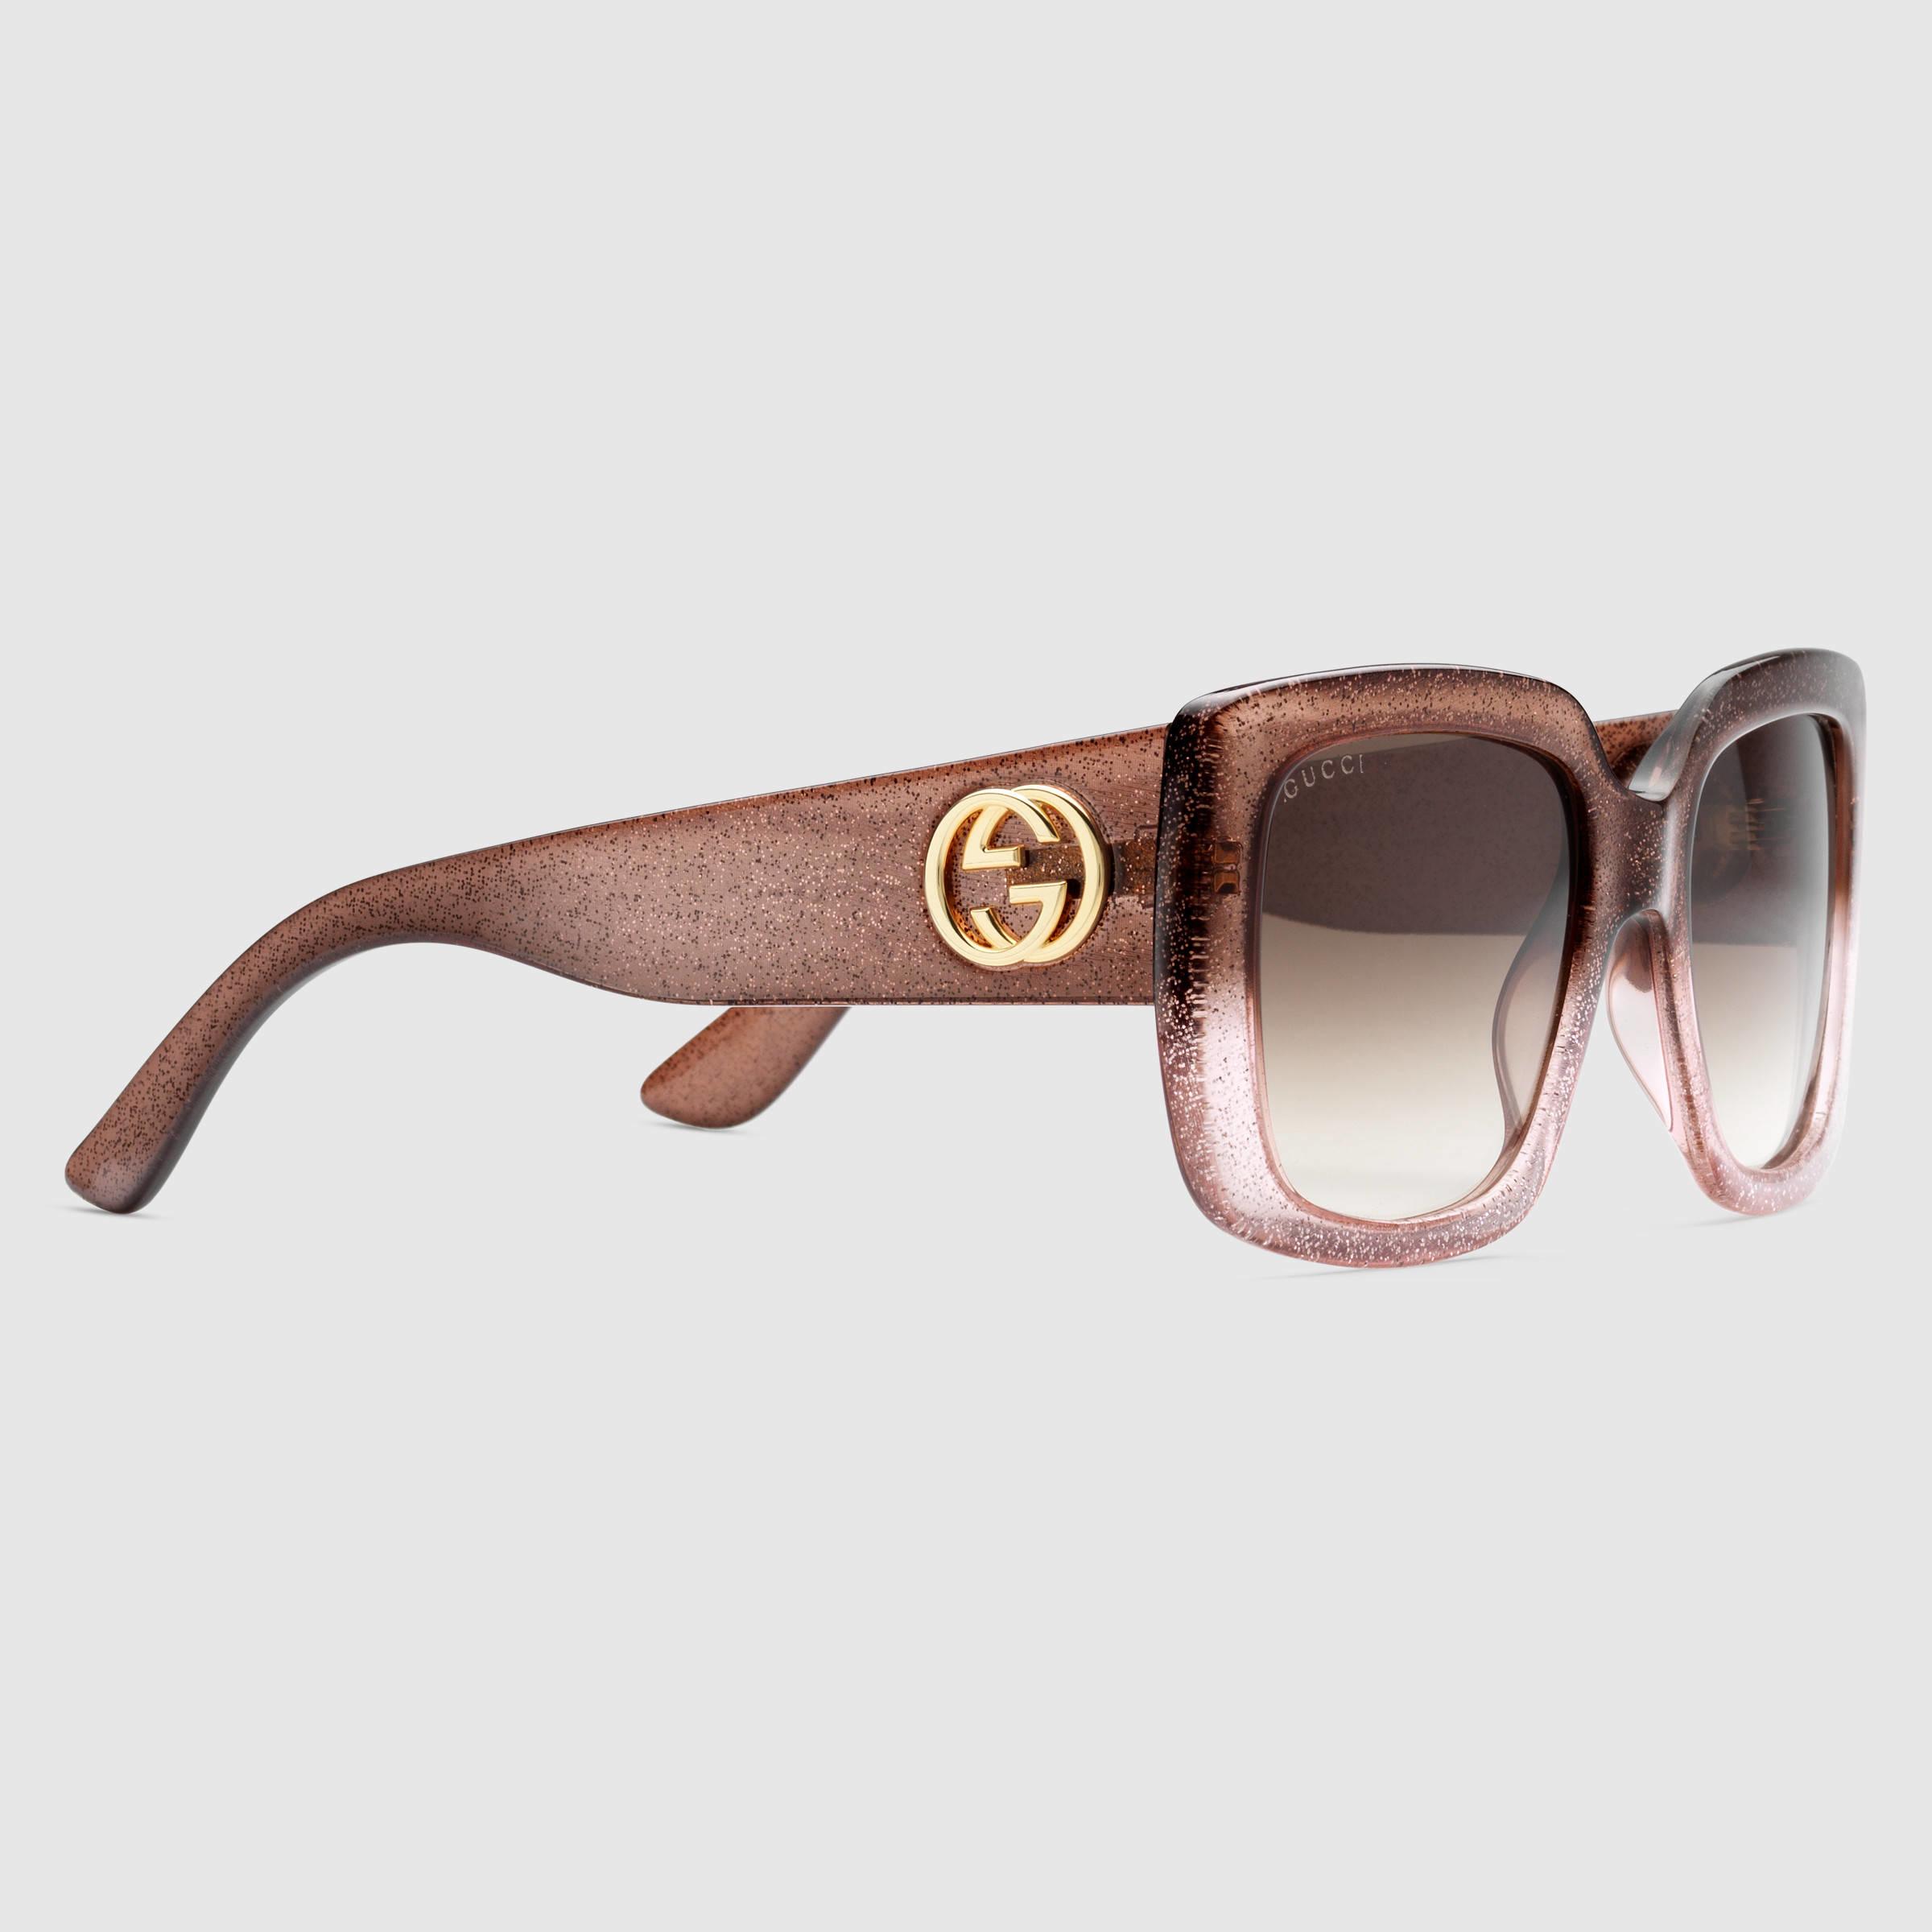 adda8802b05 Gucci Square-frame Optyl Sunglasses in Pink - Lyst